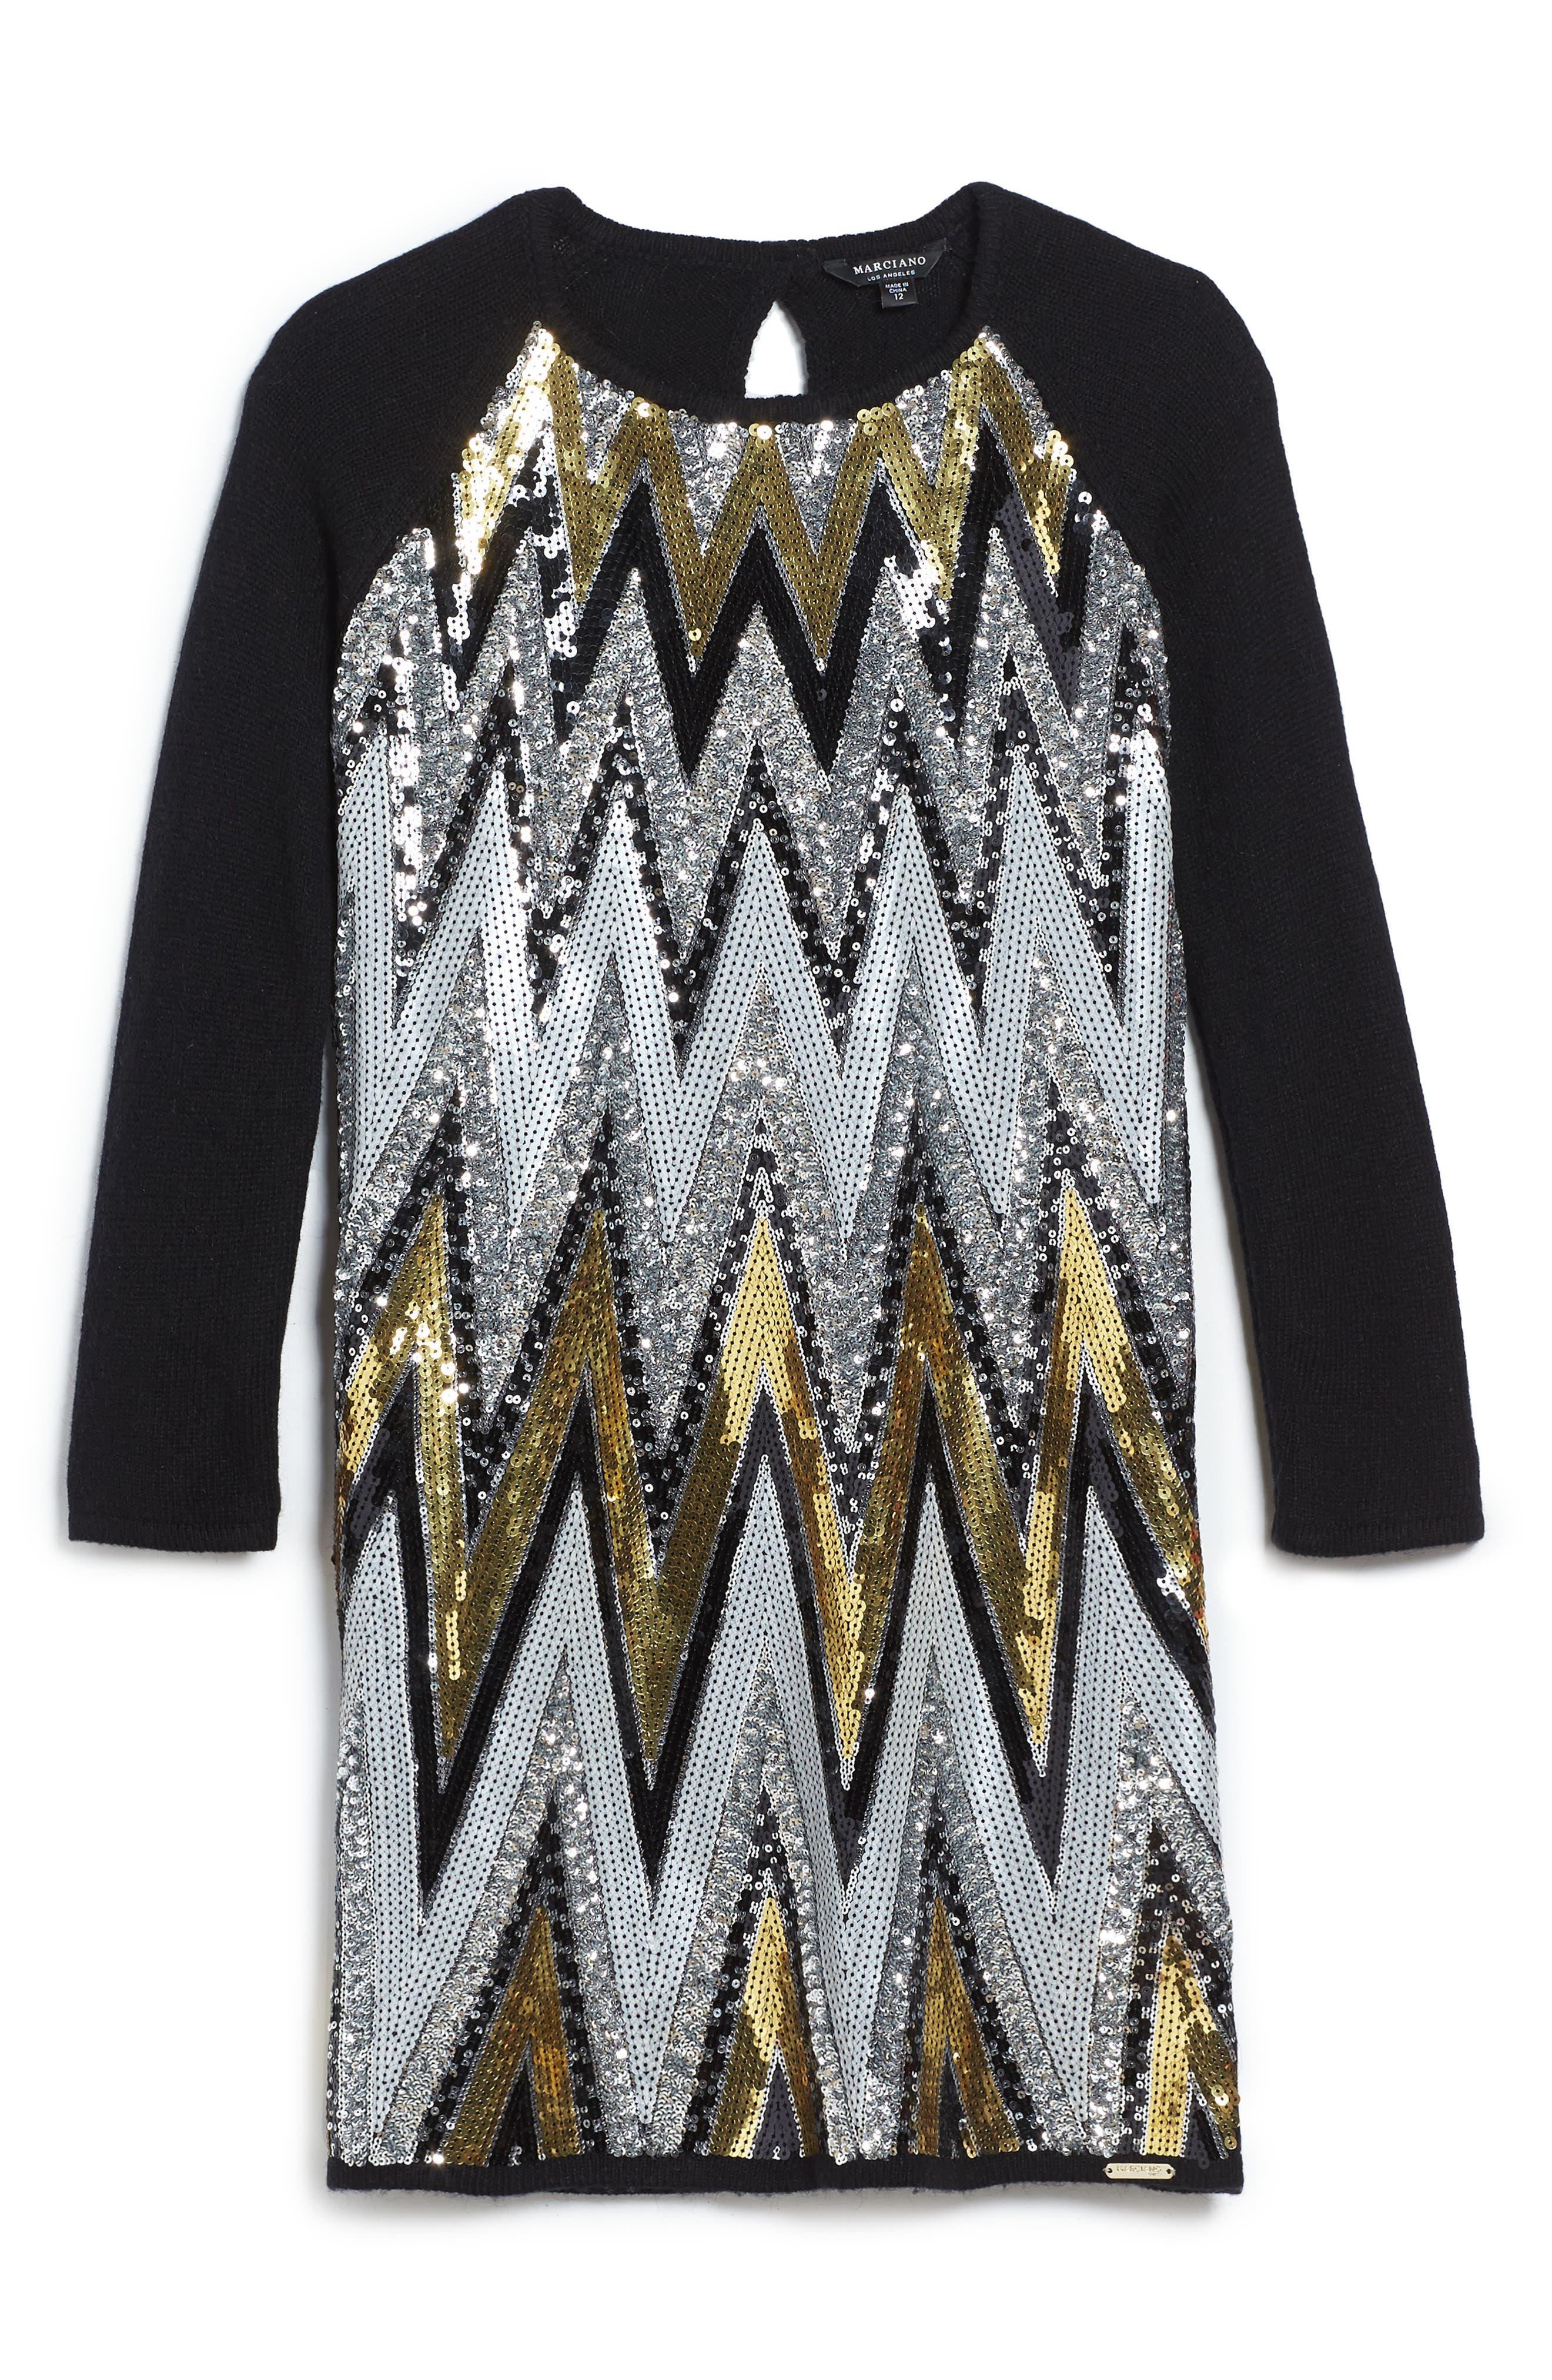 Alternate Image 1 Selected - Marciano Chevron Sequin Sweater Dress (Big Girls)